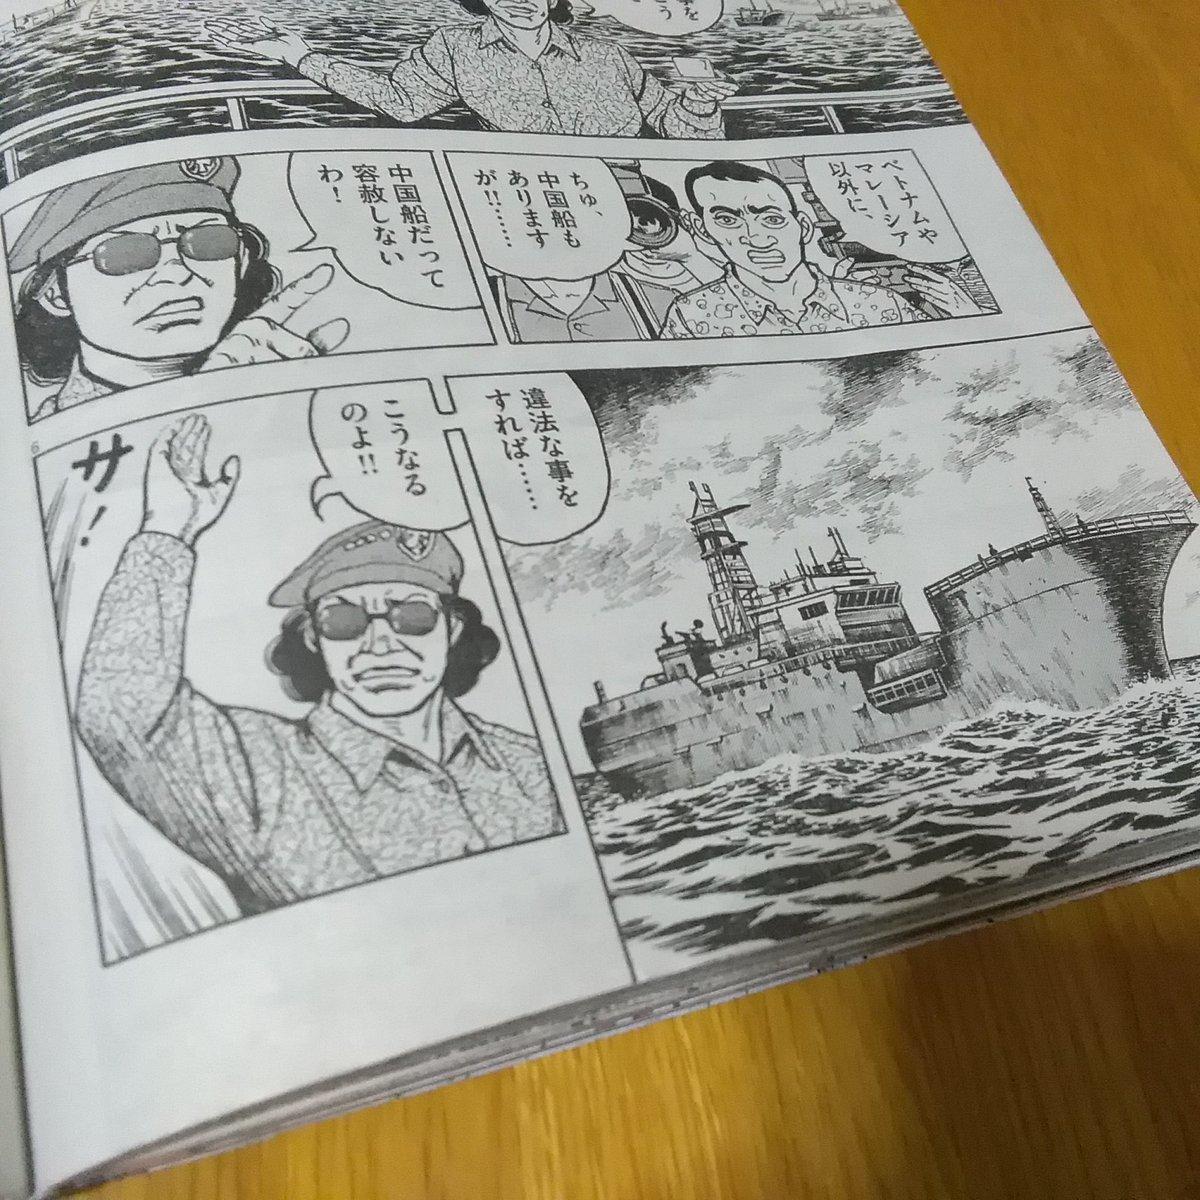 Komik Jepang Susi Pudjiastuti